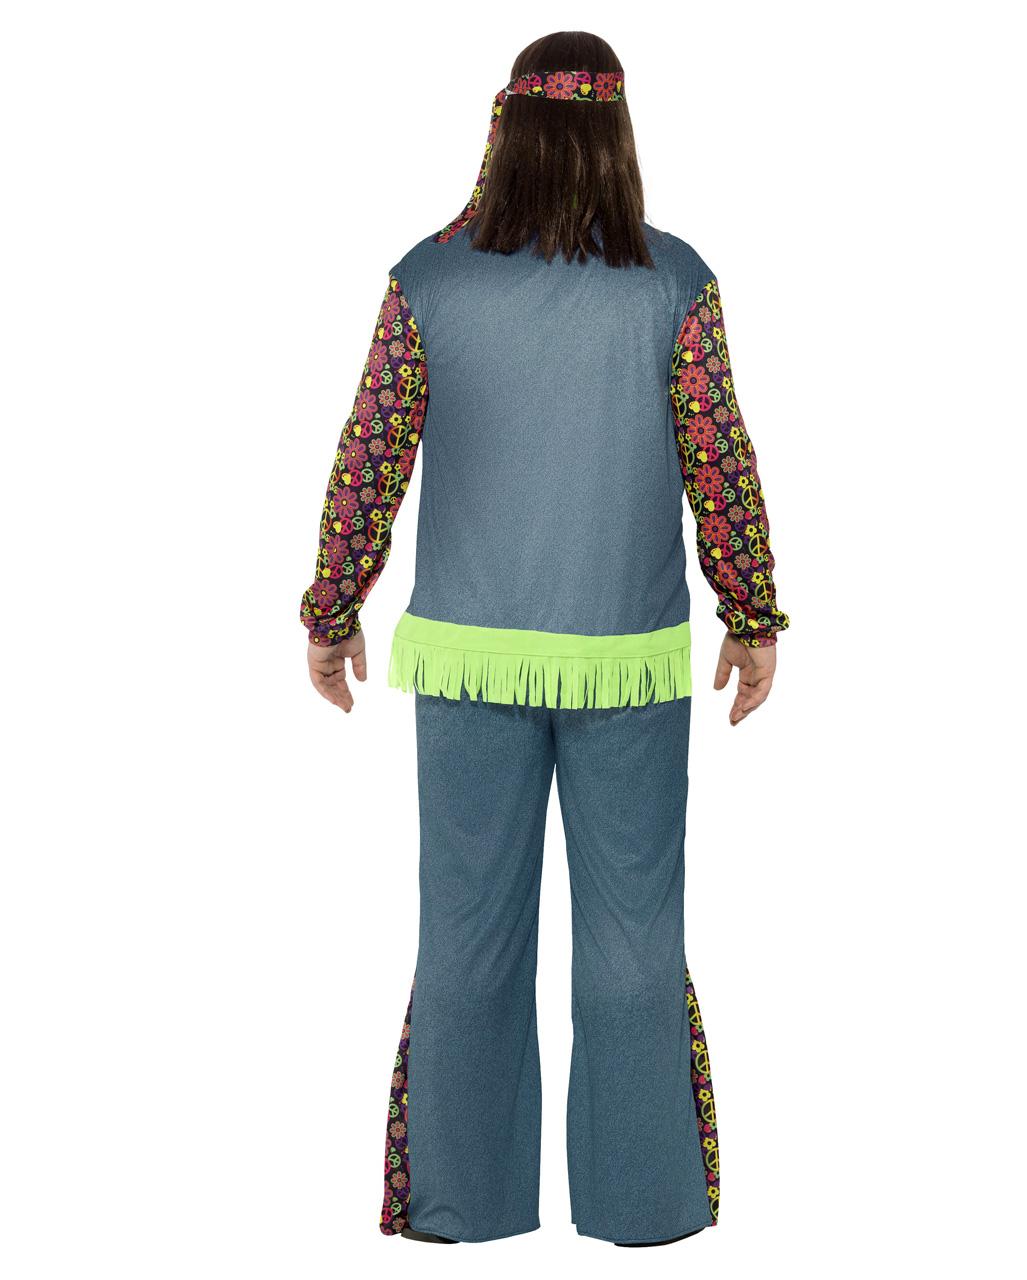 Hippie Herrenkostu00fcm in Plus Size fu00fcr Fasching! | Karneval Universe